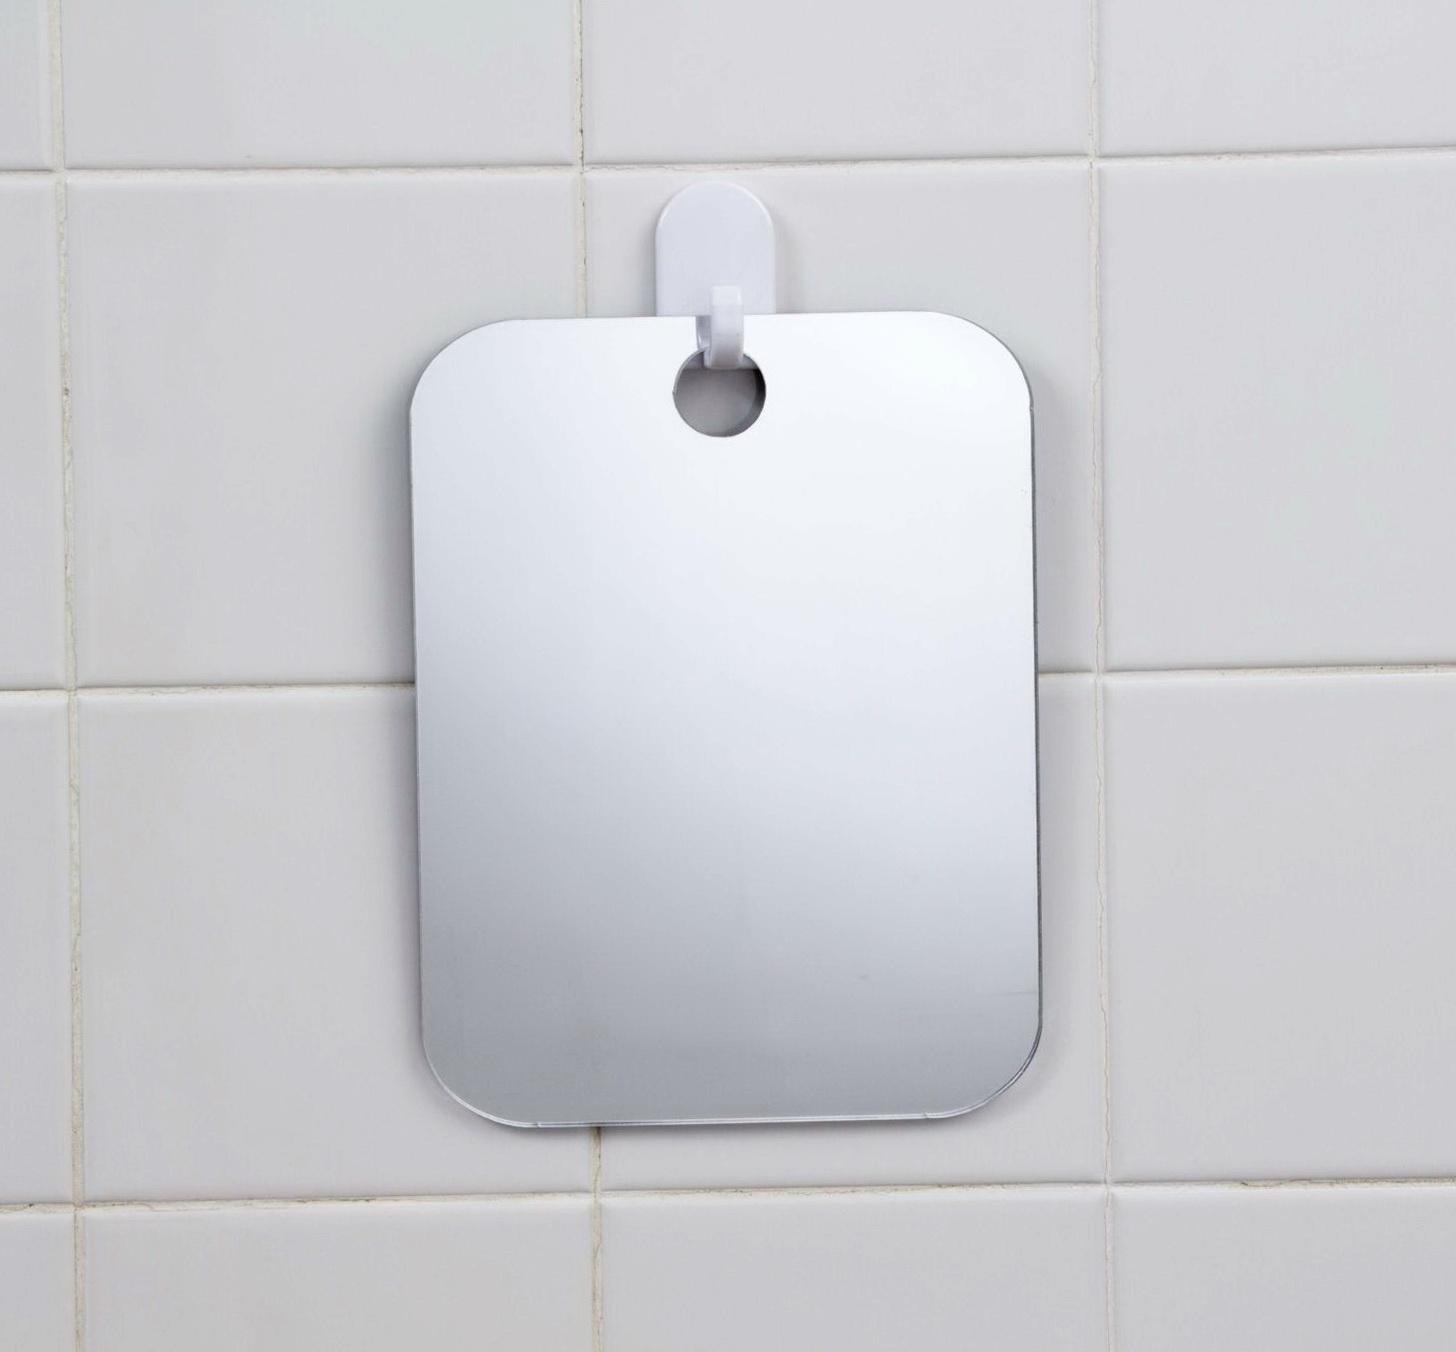 Fog Free Shower Mirror Target